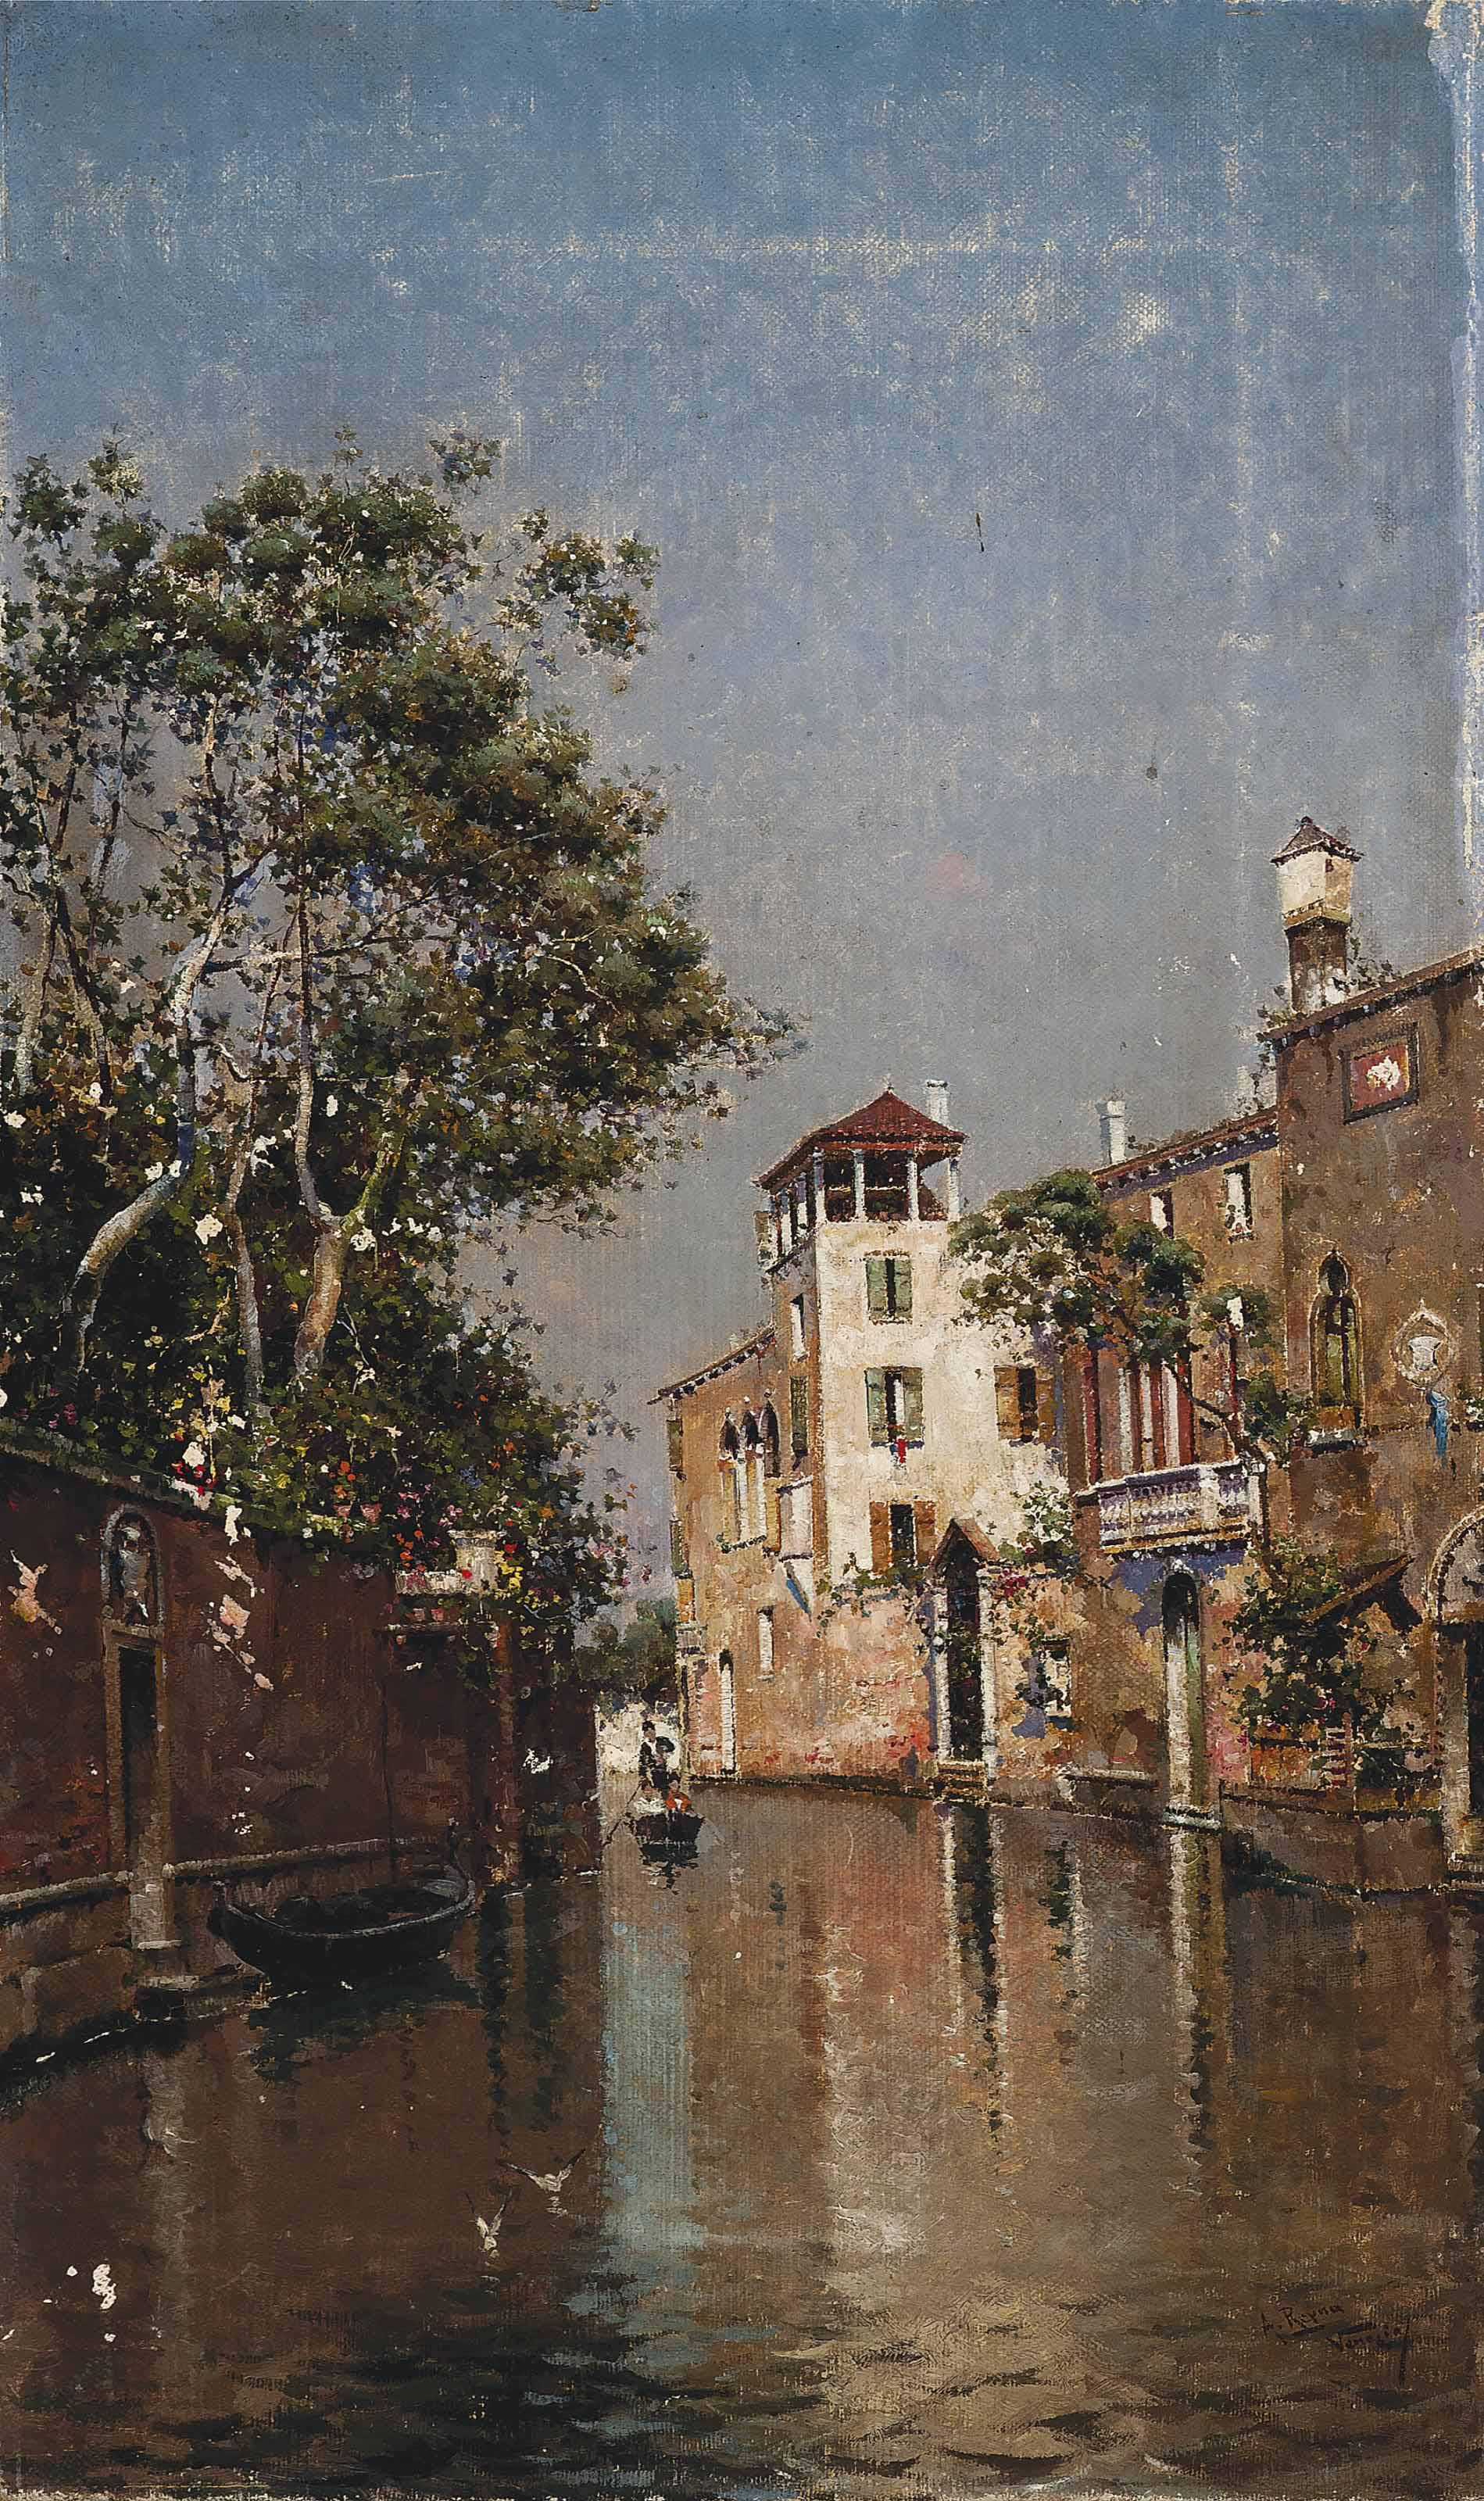 A gondola ride on a Venetian backwater